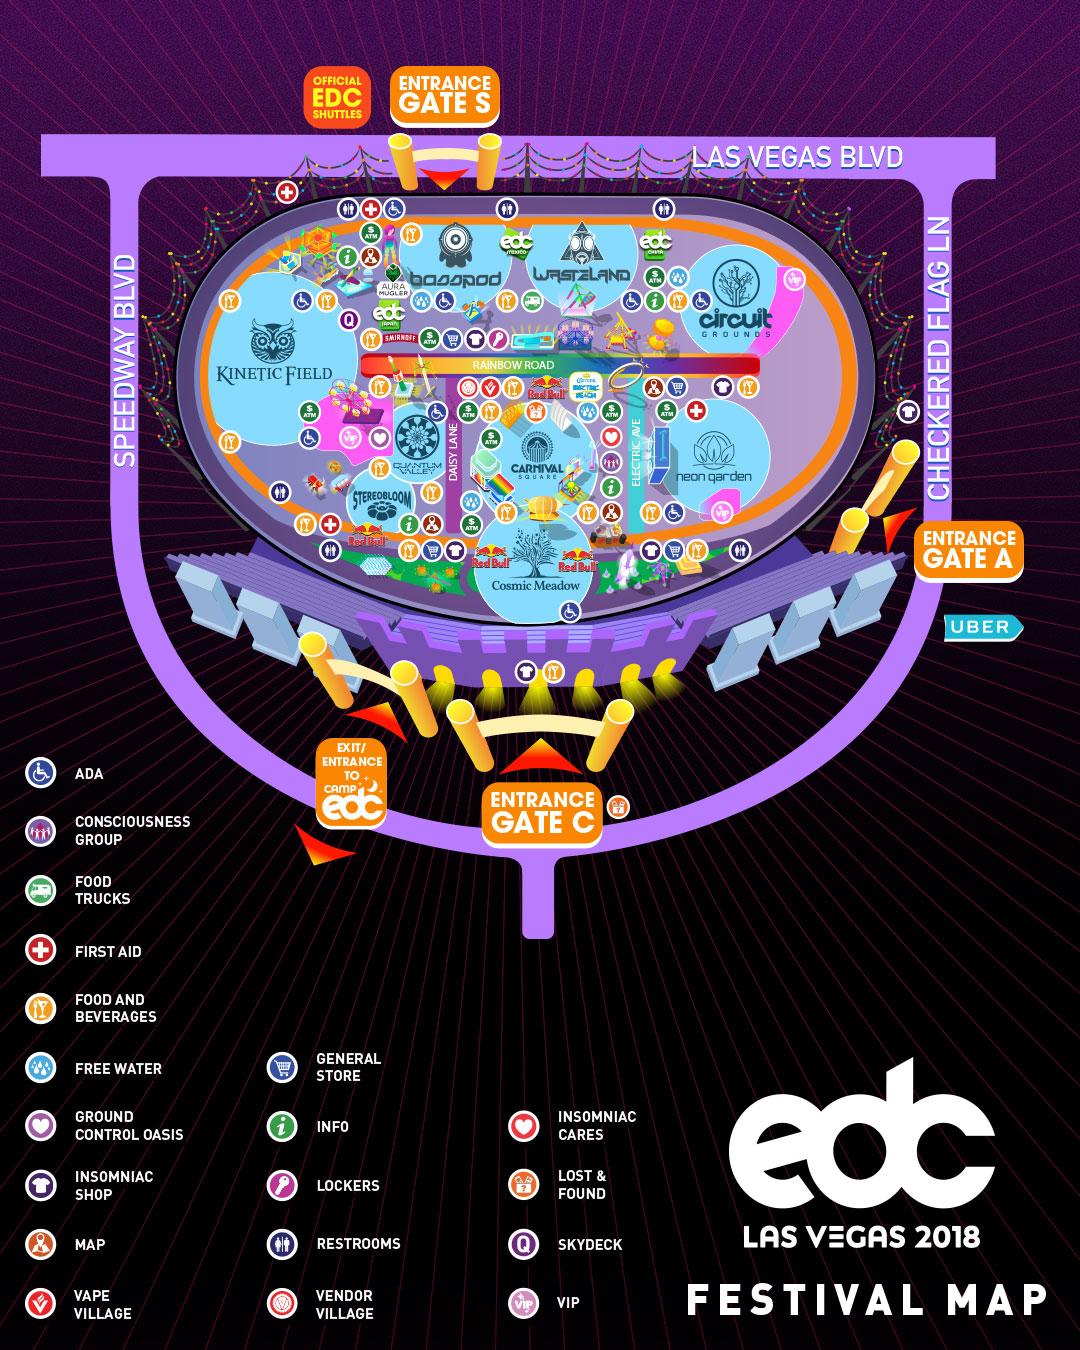 EDC Las Vegas 2018 festival map